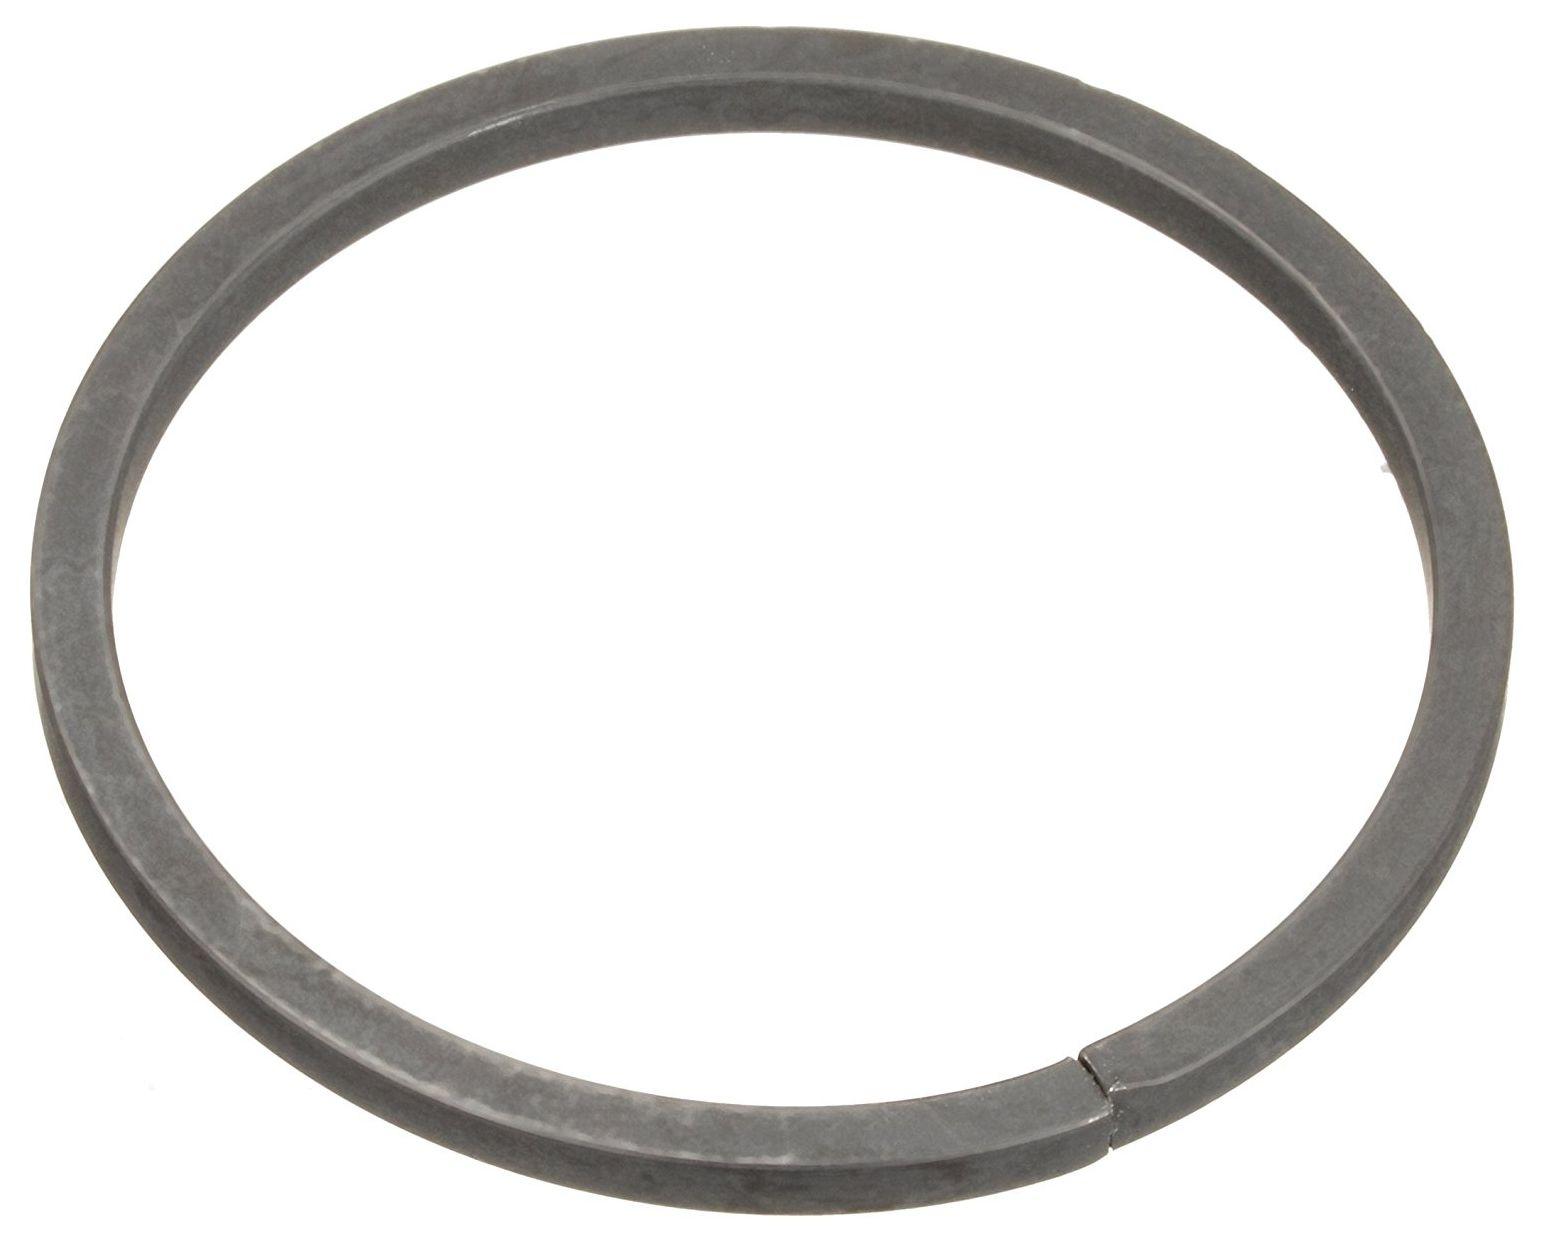 Запчасть Shimano стопорное кольцо для SG-8R20 (Y32120100) цена